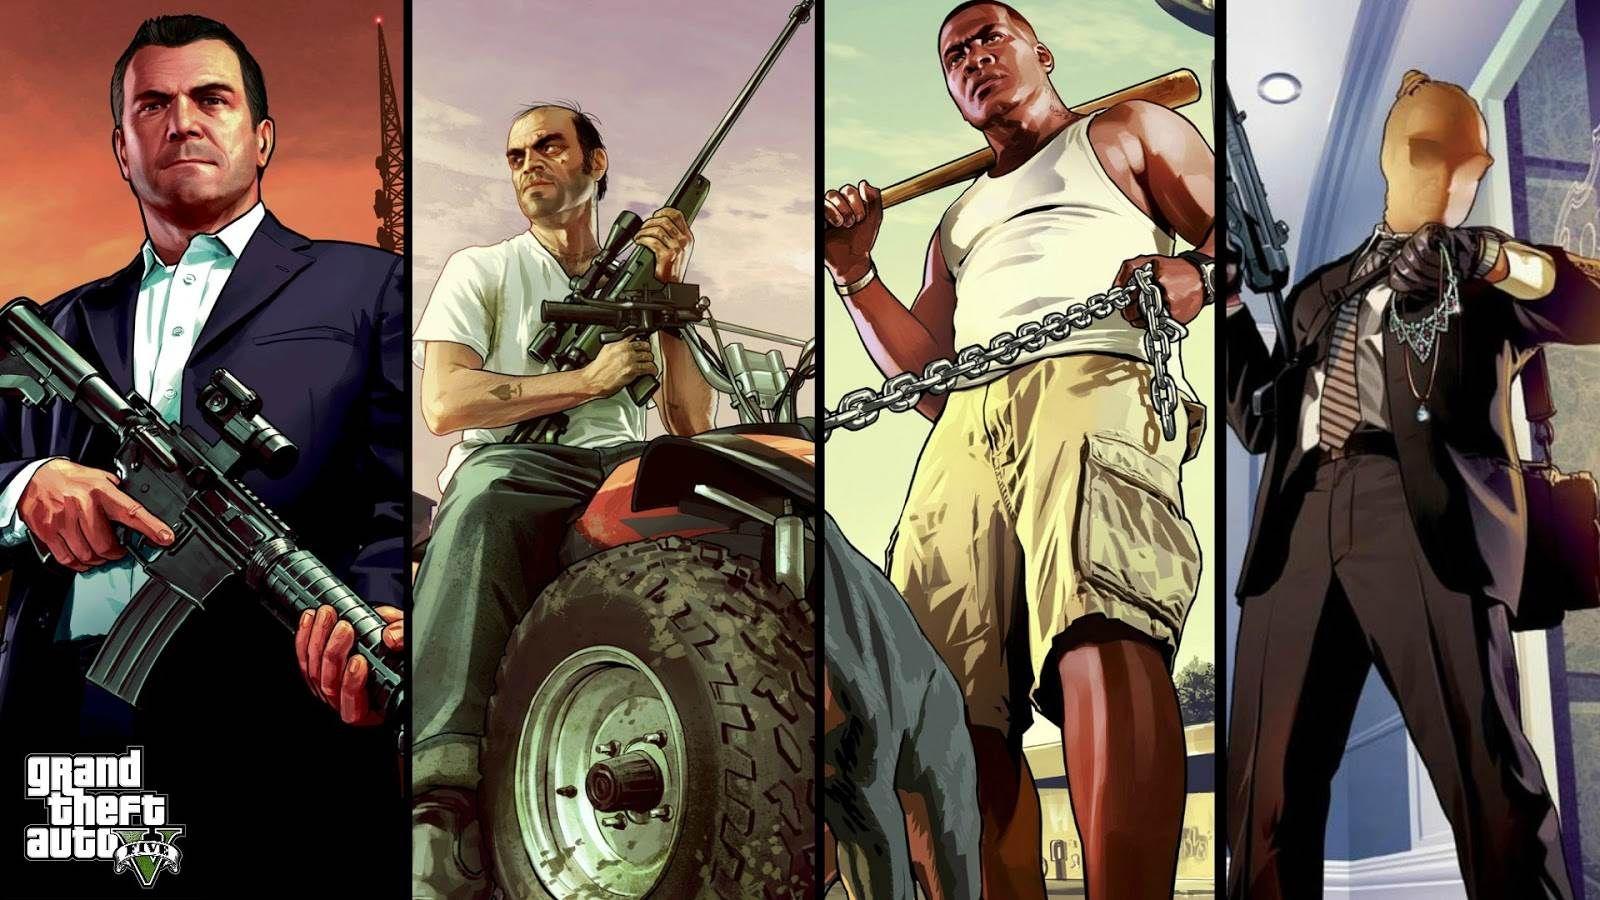 Grand Theft Auto V HD Wallpapers Backgrounds Wallpaper 1920x1080 Gta